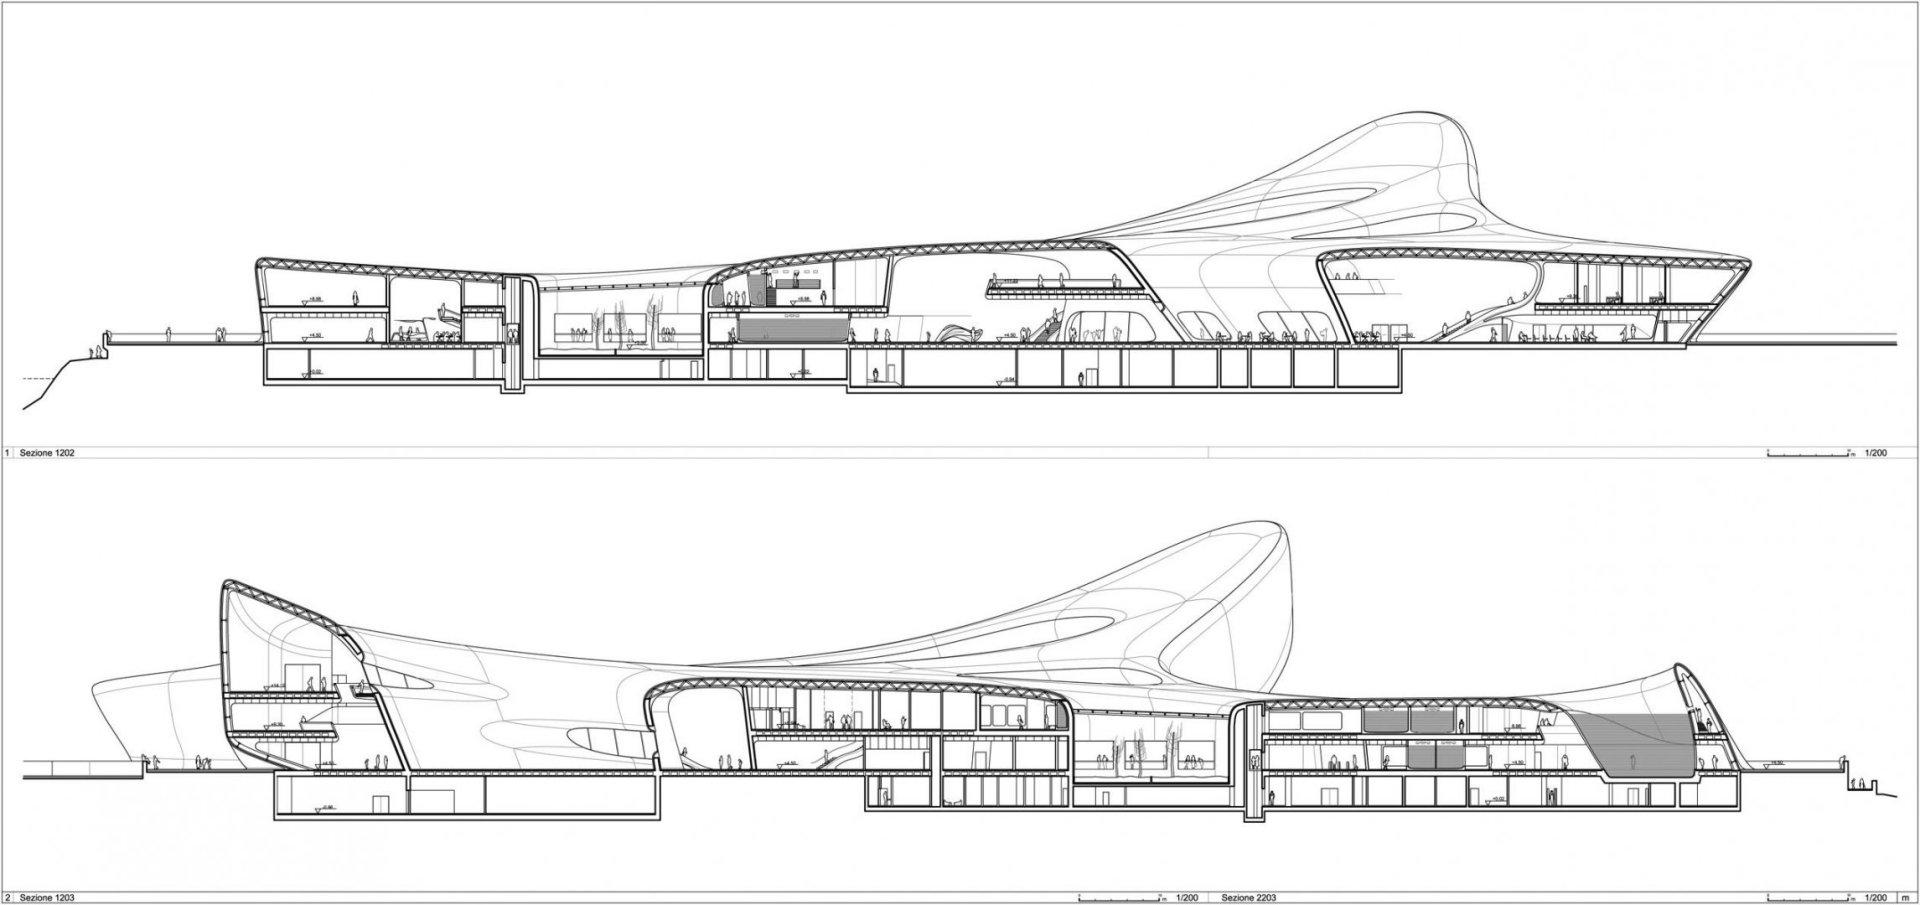 Guggenheim Museum Bilbao Floor Plan Regium Waterfront Reggio Calabria